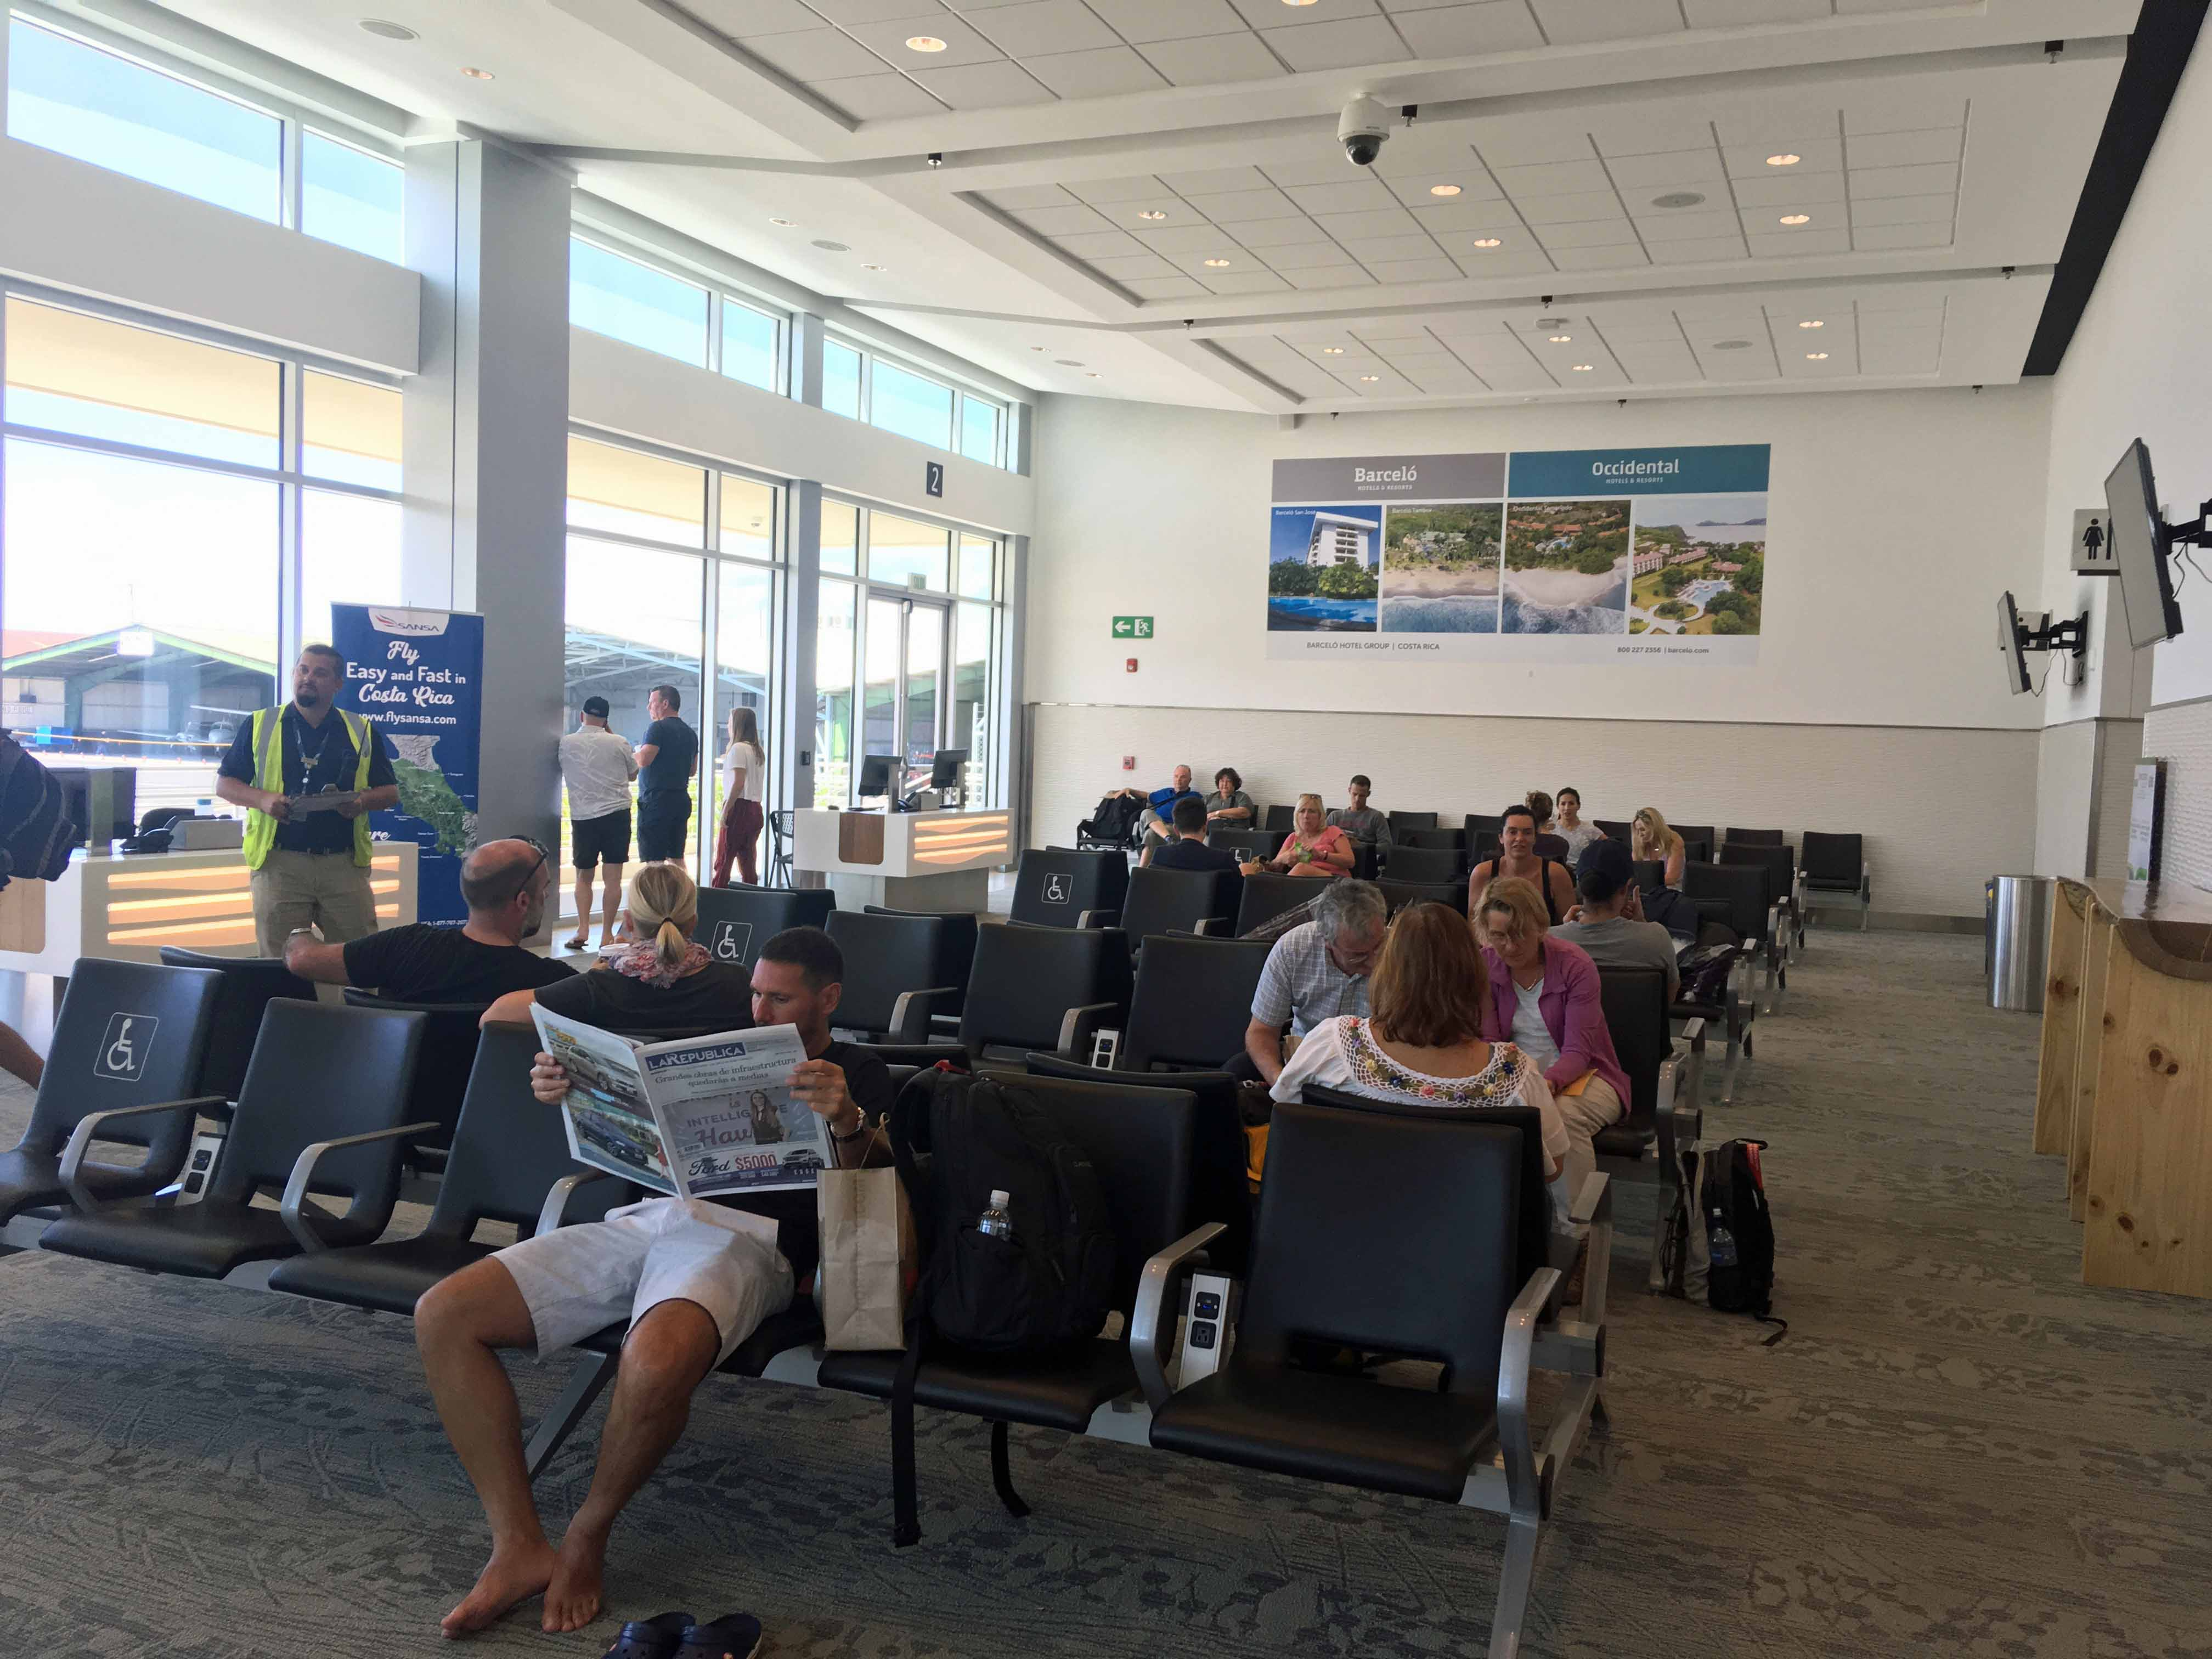 terminal inside.jpg